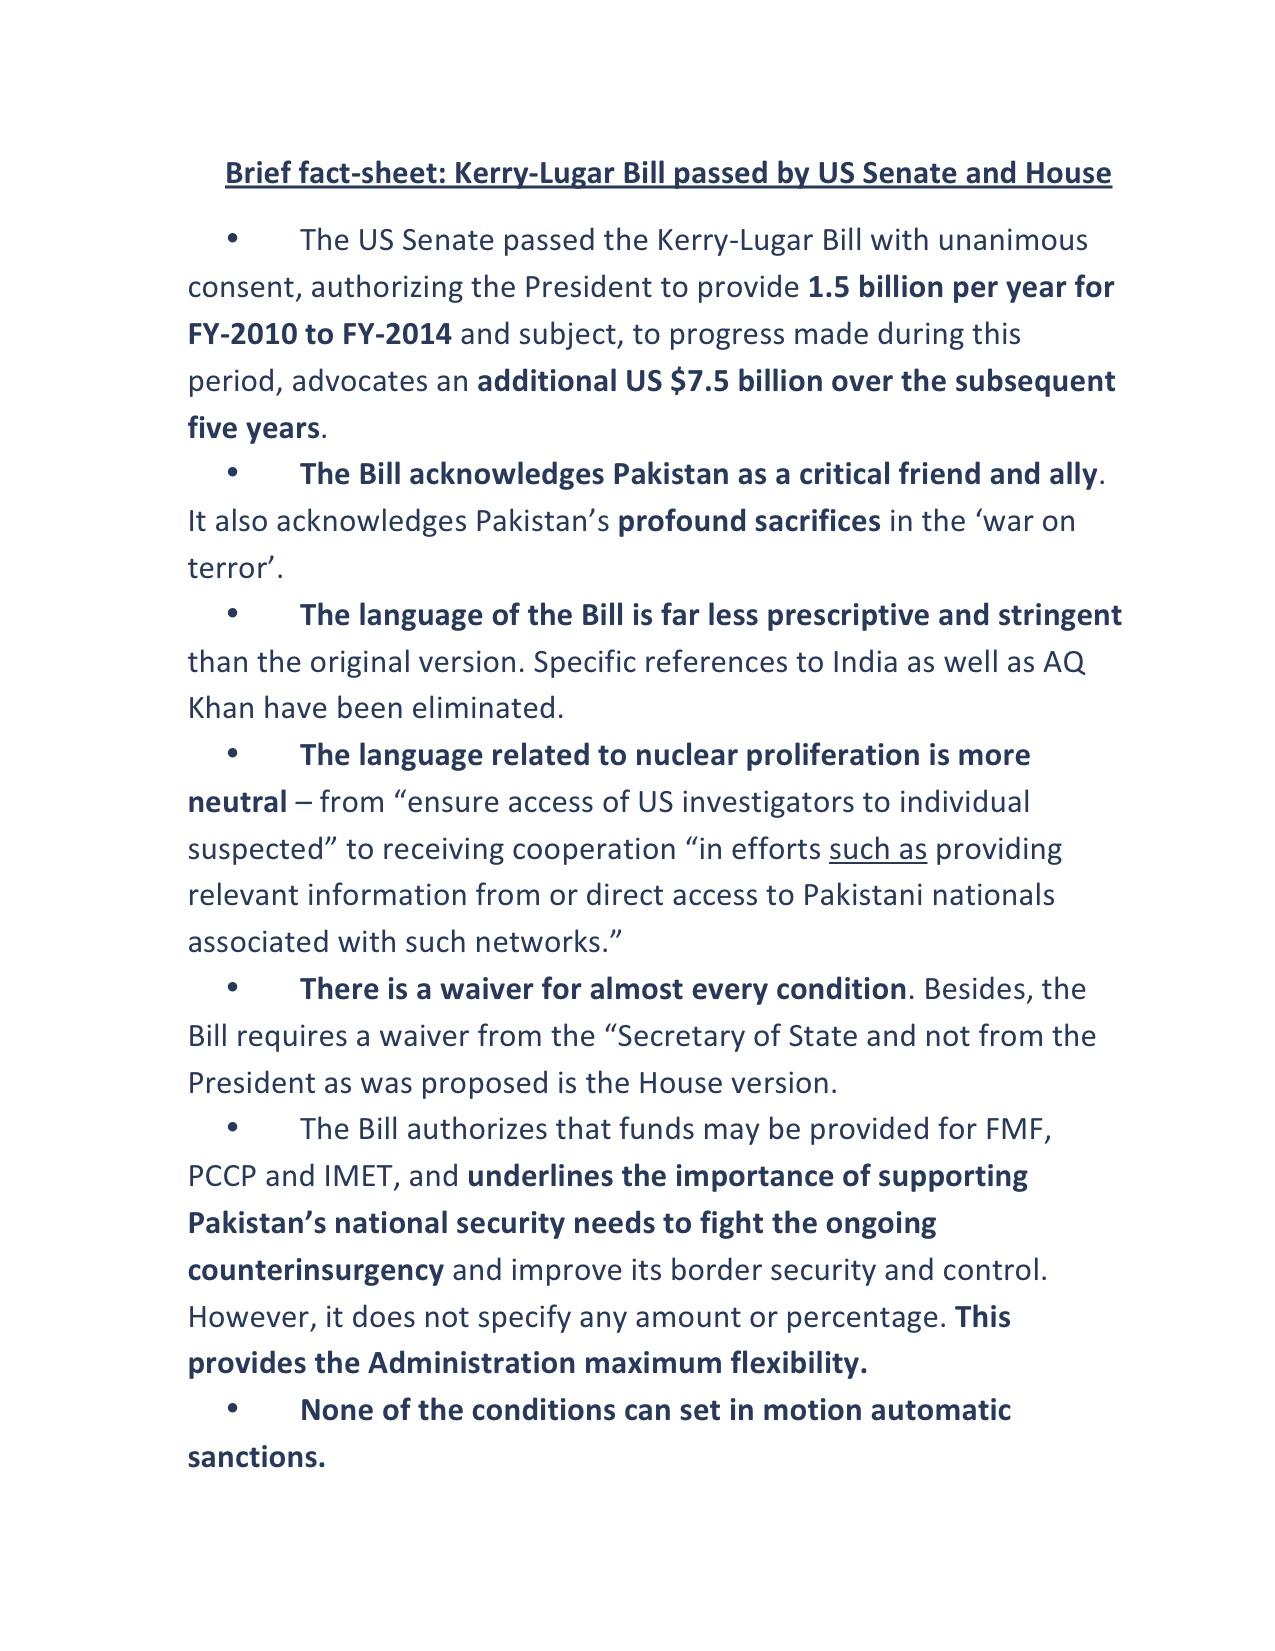 Kerry Lugar Bill factsheet